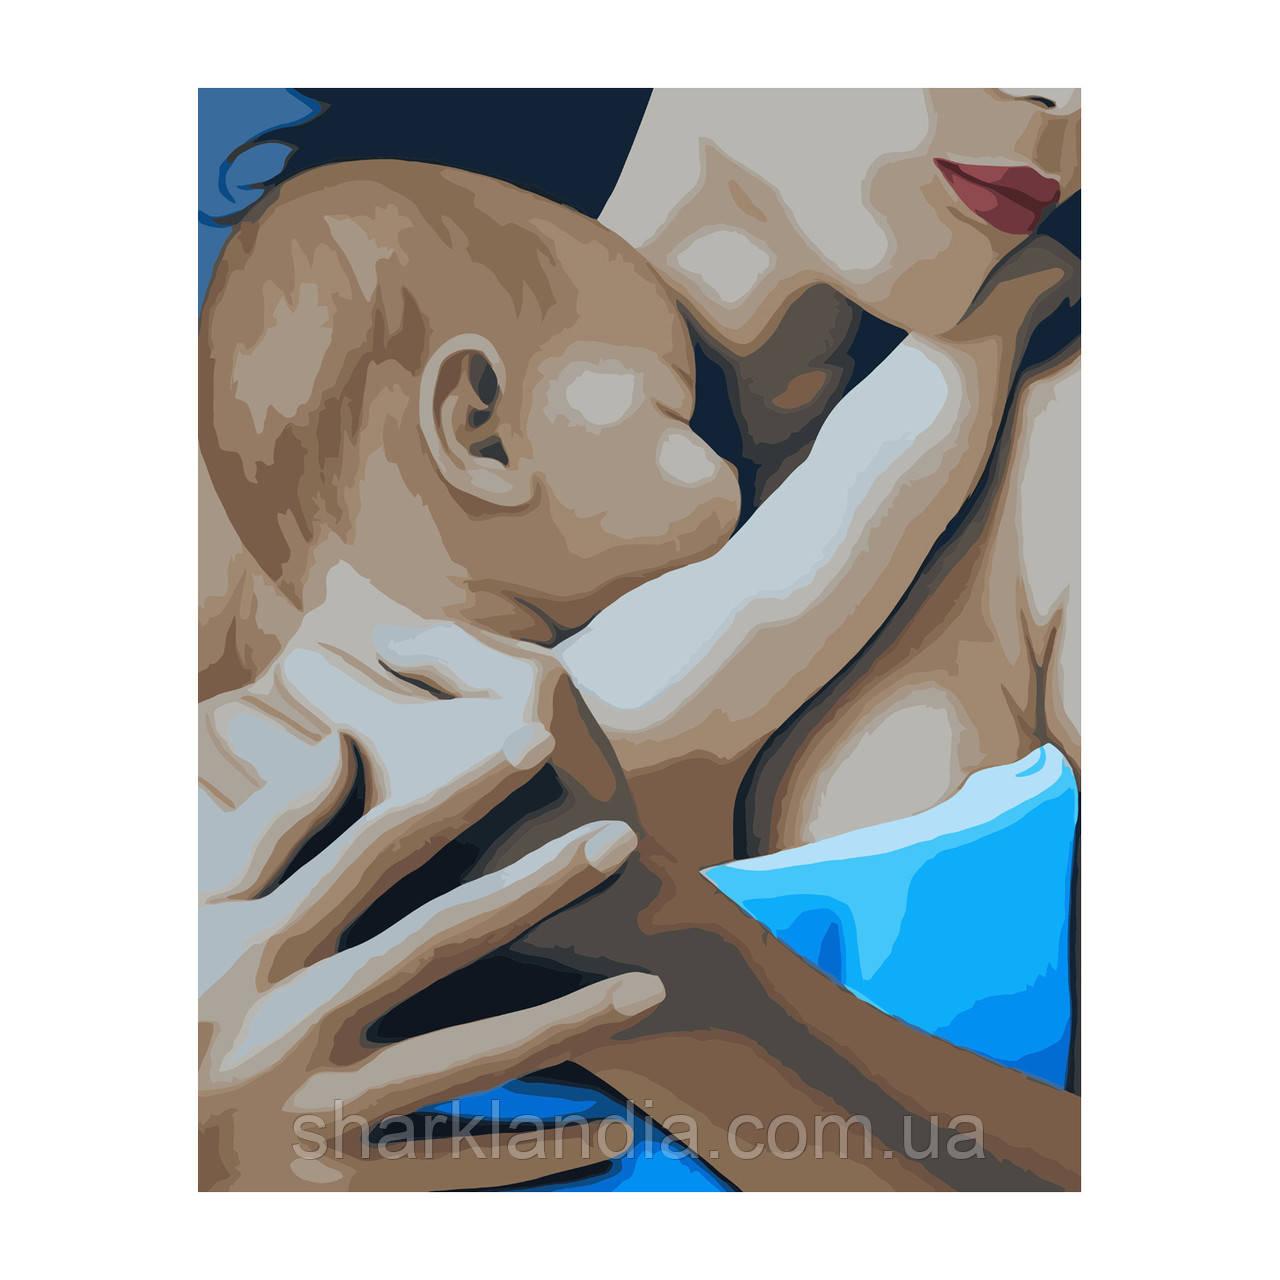 Картина за номерами Материнство  40*50см Strateg Розмальовки